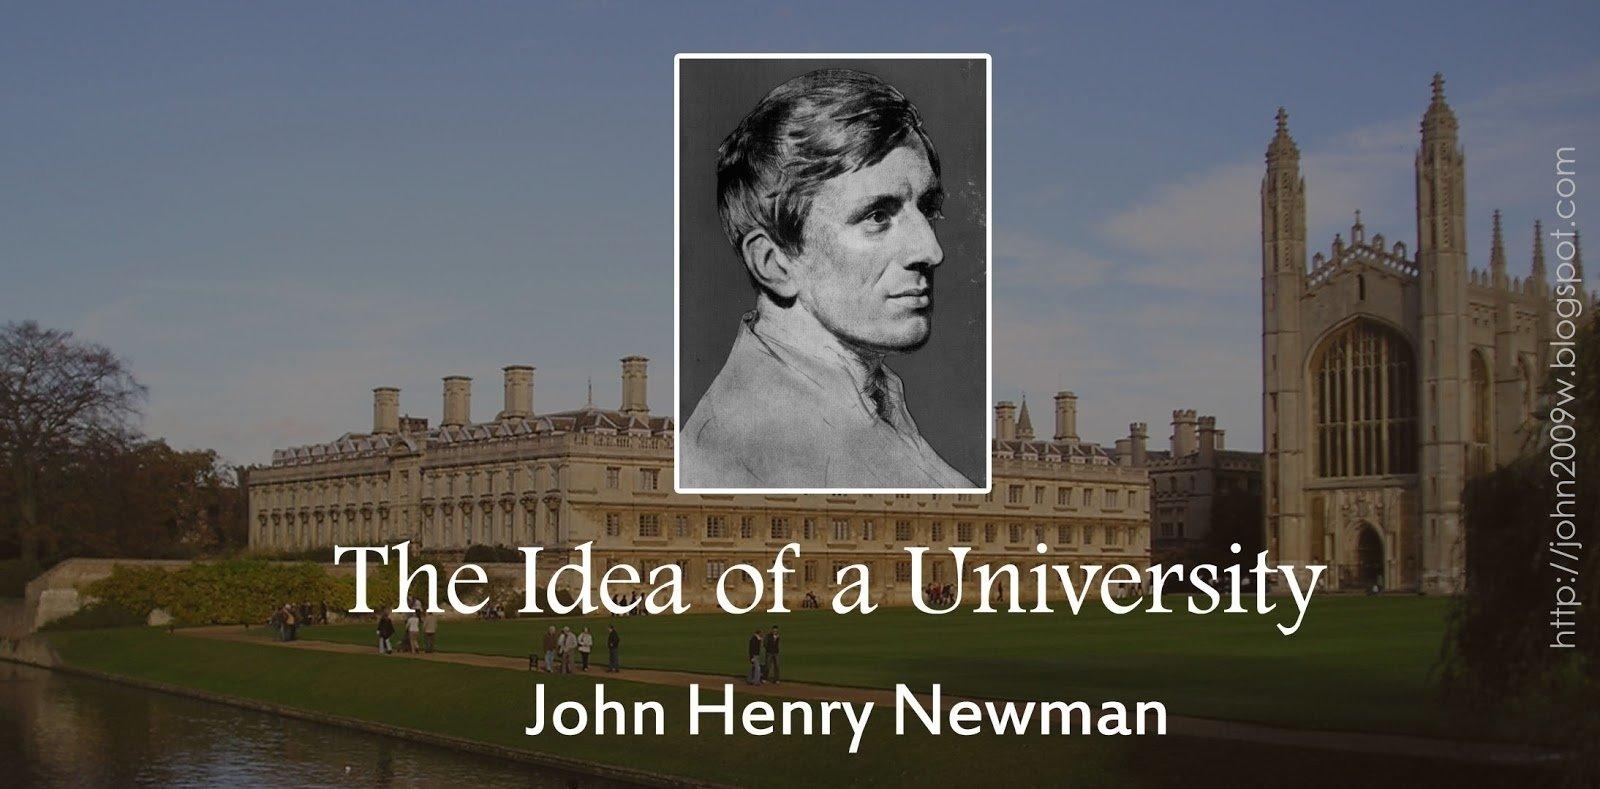 10 Awesome John Henry Newman The Idea Of A University february 2018 mini blog